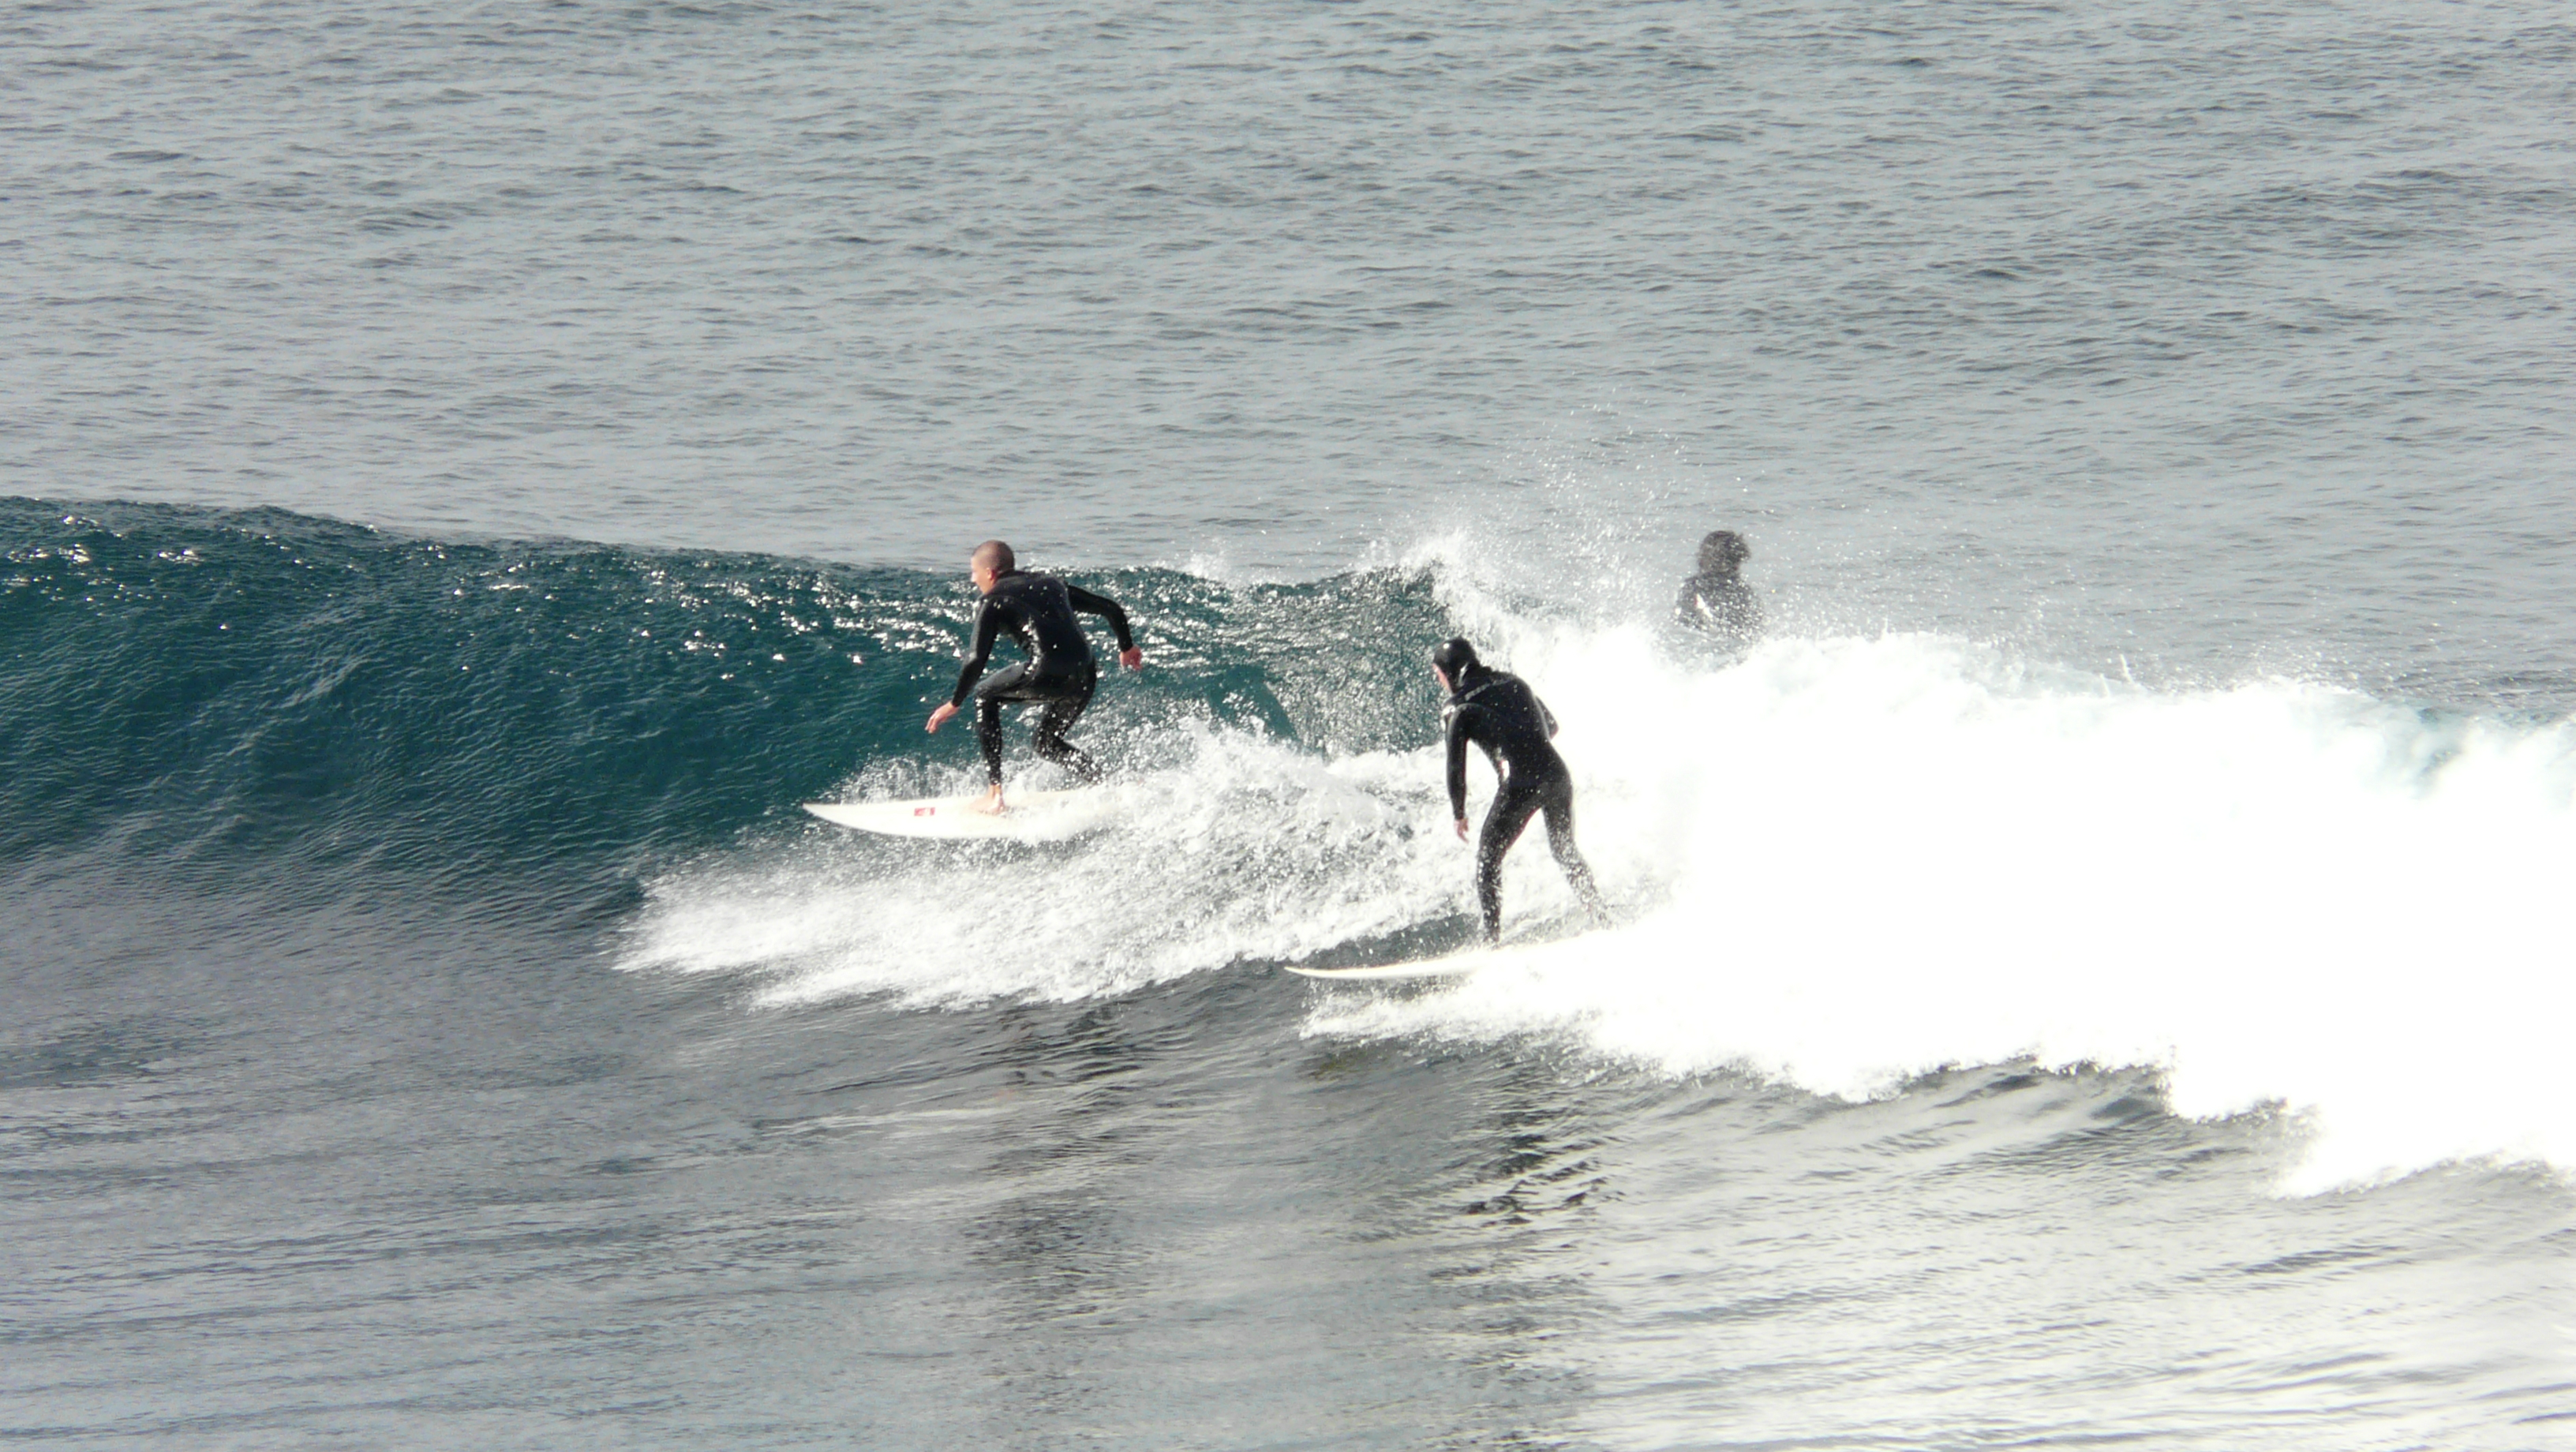 Surfers at Bells Beach, Victoria, Australia